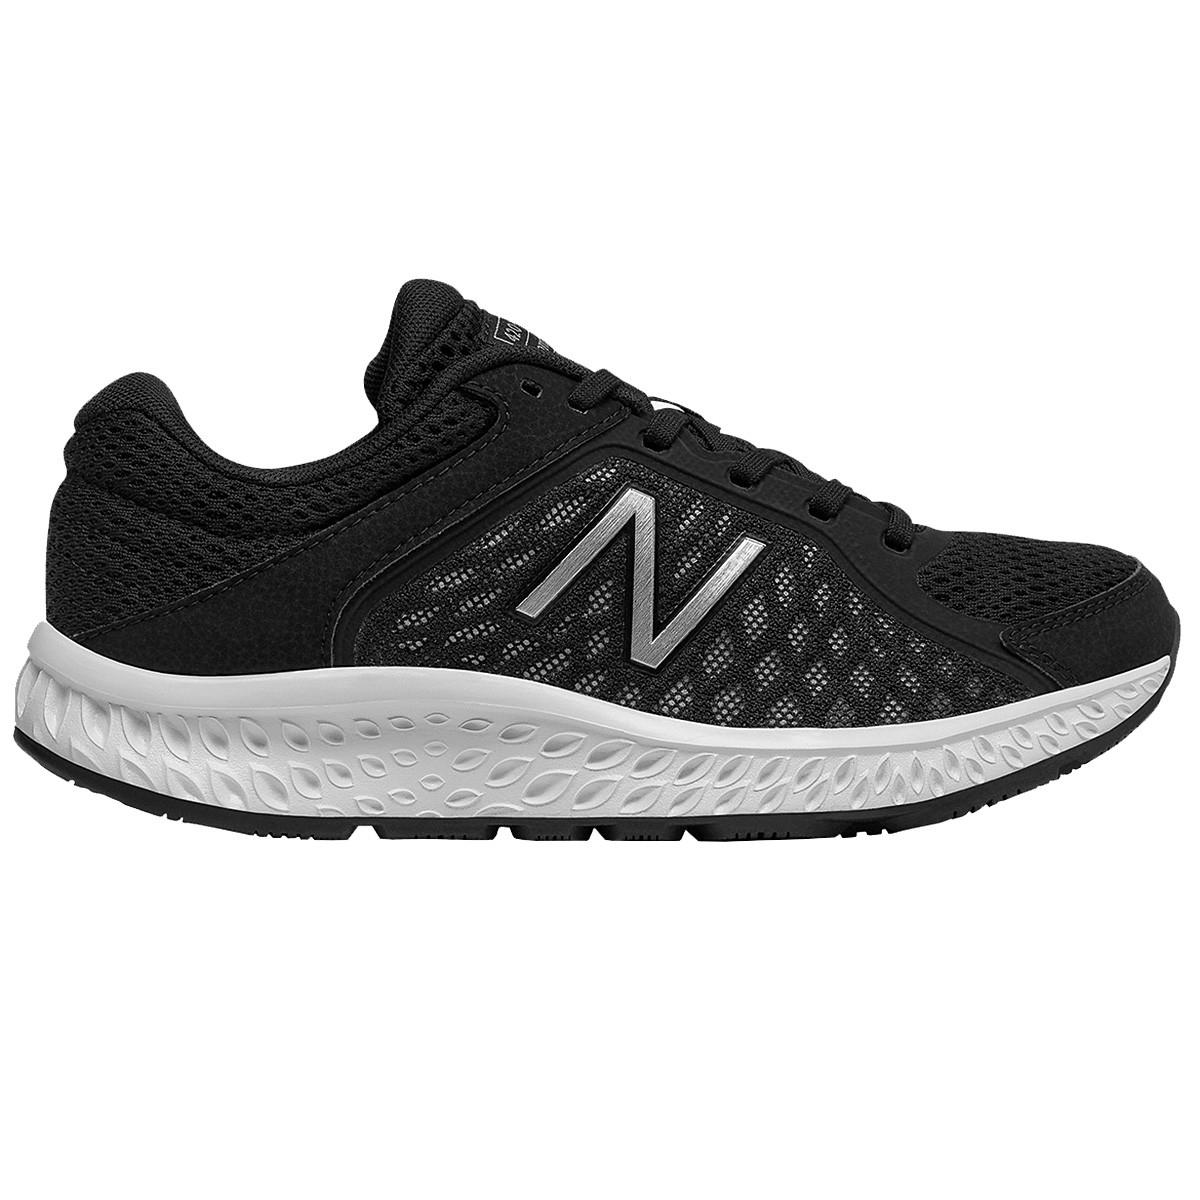 Chaussures 420 New Femme Running Balance AU6AvwSqyc